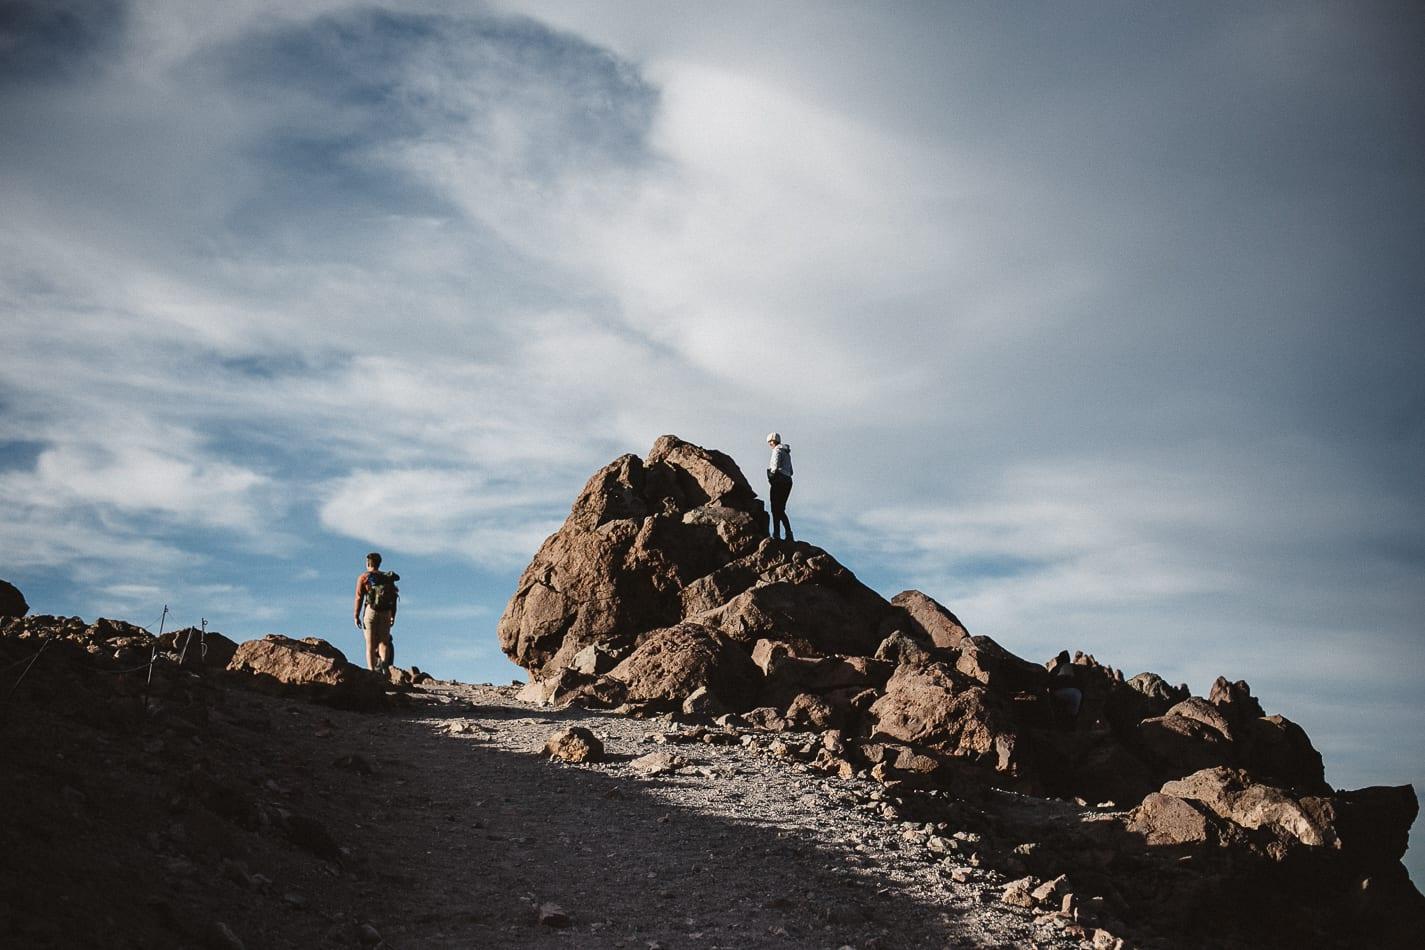 mount-lassen-california-adventure-lifestyle-photorapher-30